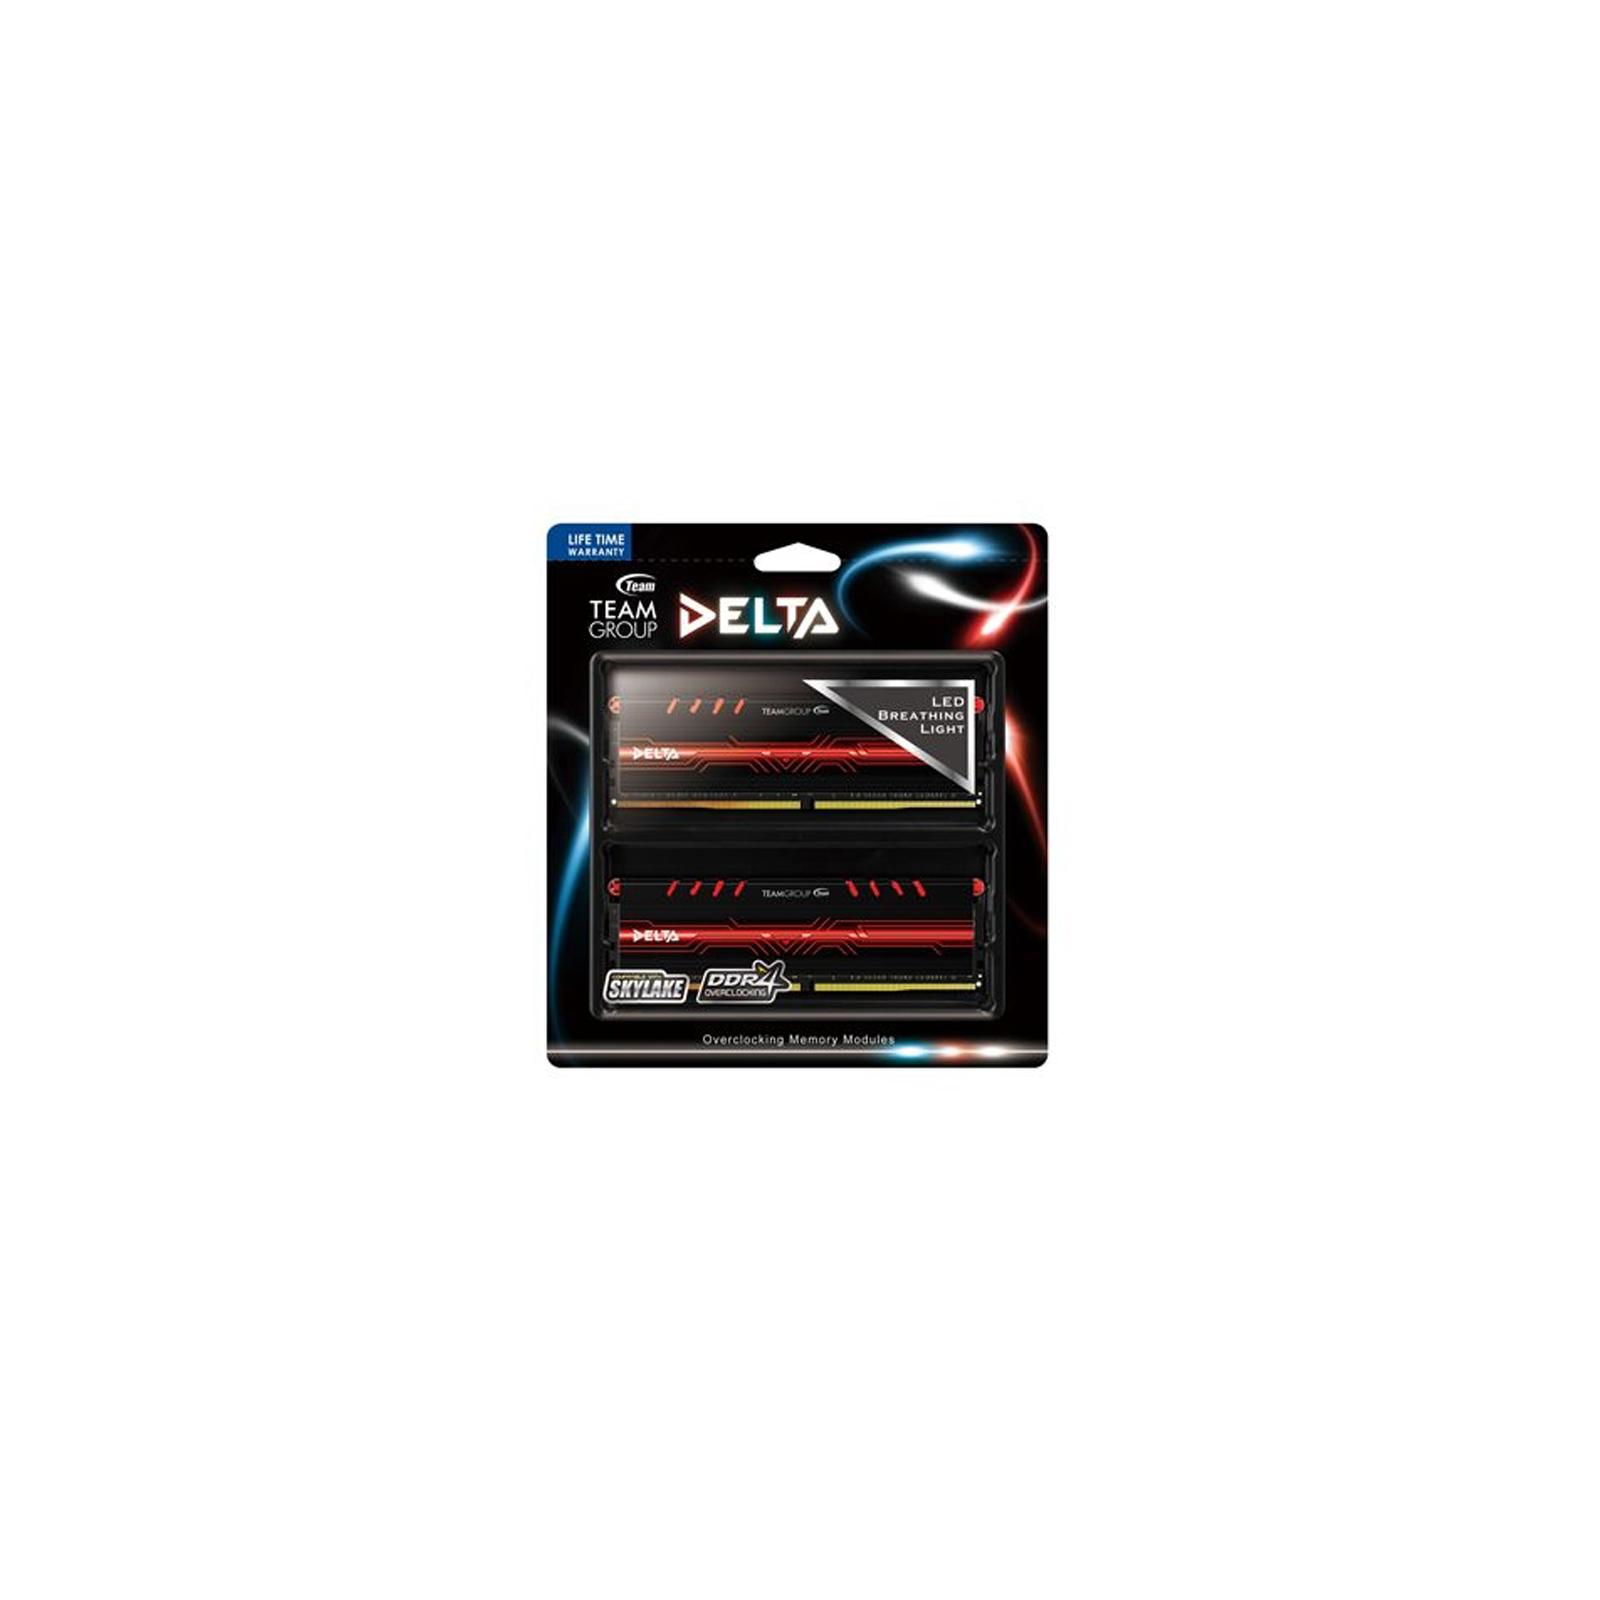 Модуль памяти для компьютера DDR4 16GB (2x8GB) 3000 MHz Delta Red LED Team (TDTRD416G3000HC16ADC01) изображение 3